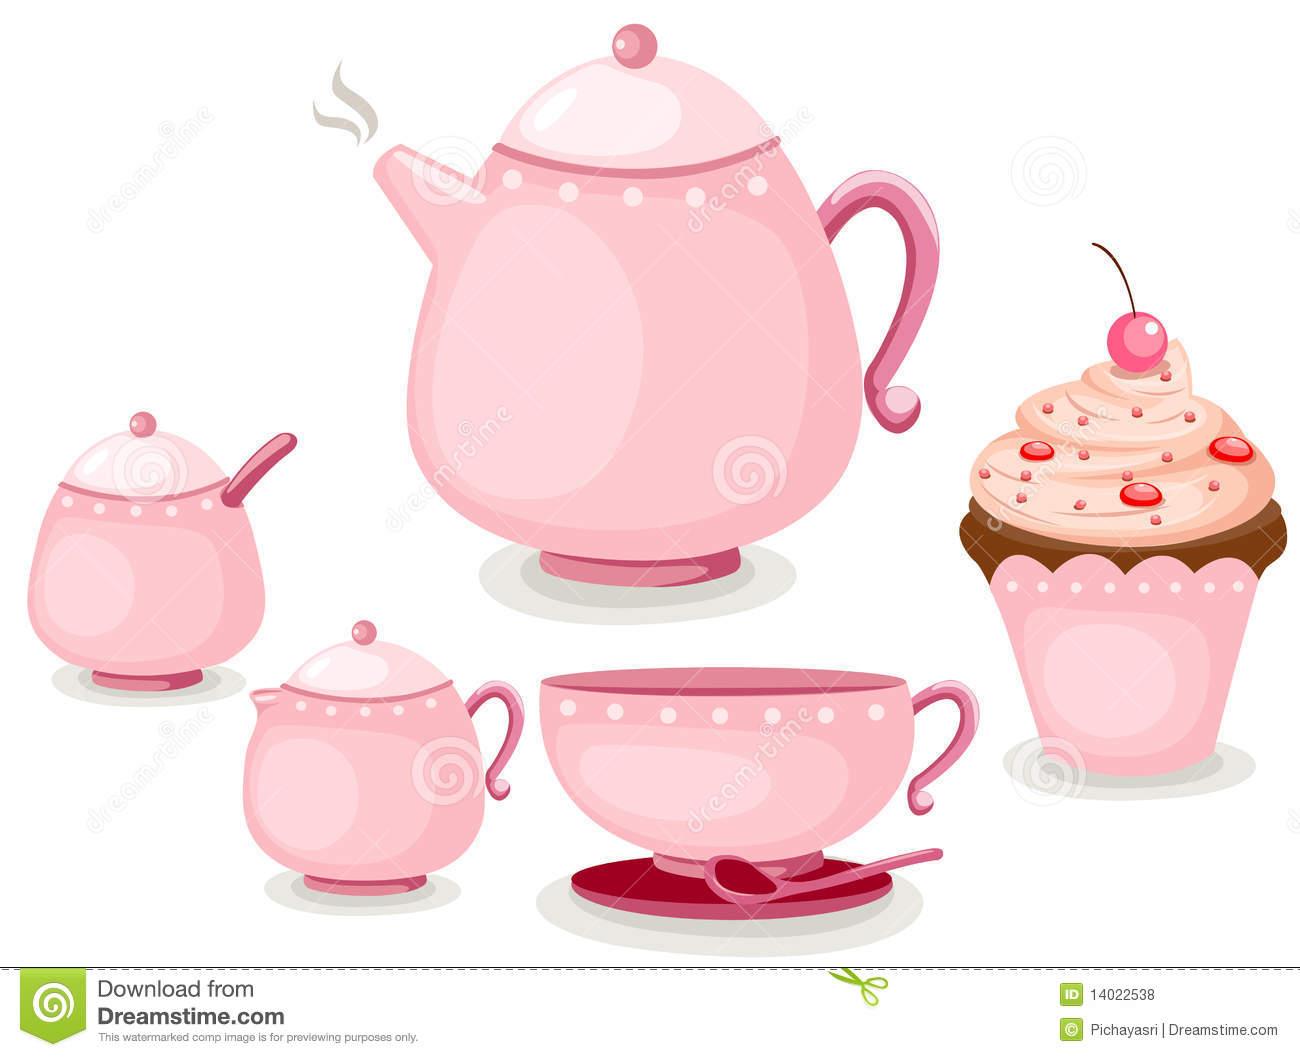 Coffee Set Or Tea Set And Cup Cake-Coffee set or tea set and cup cake-5